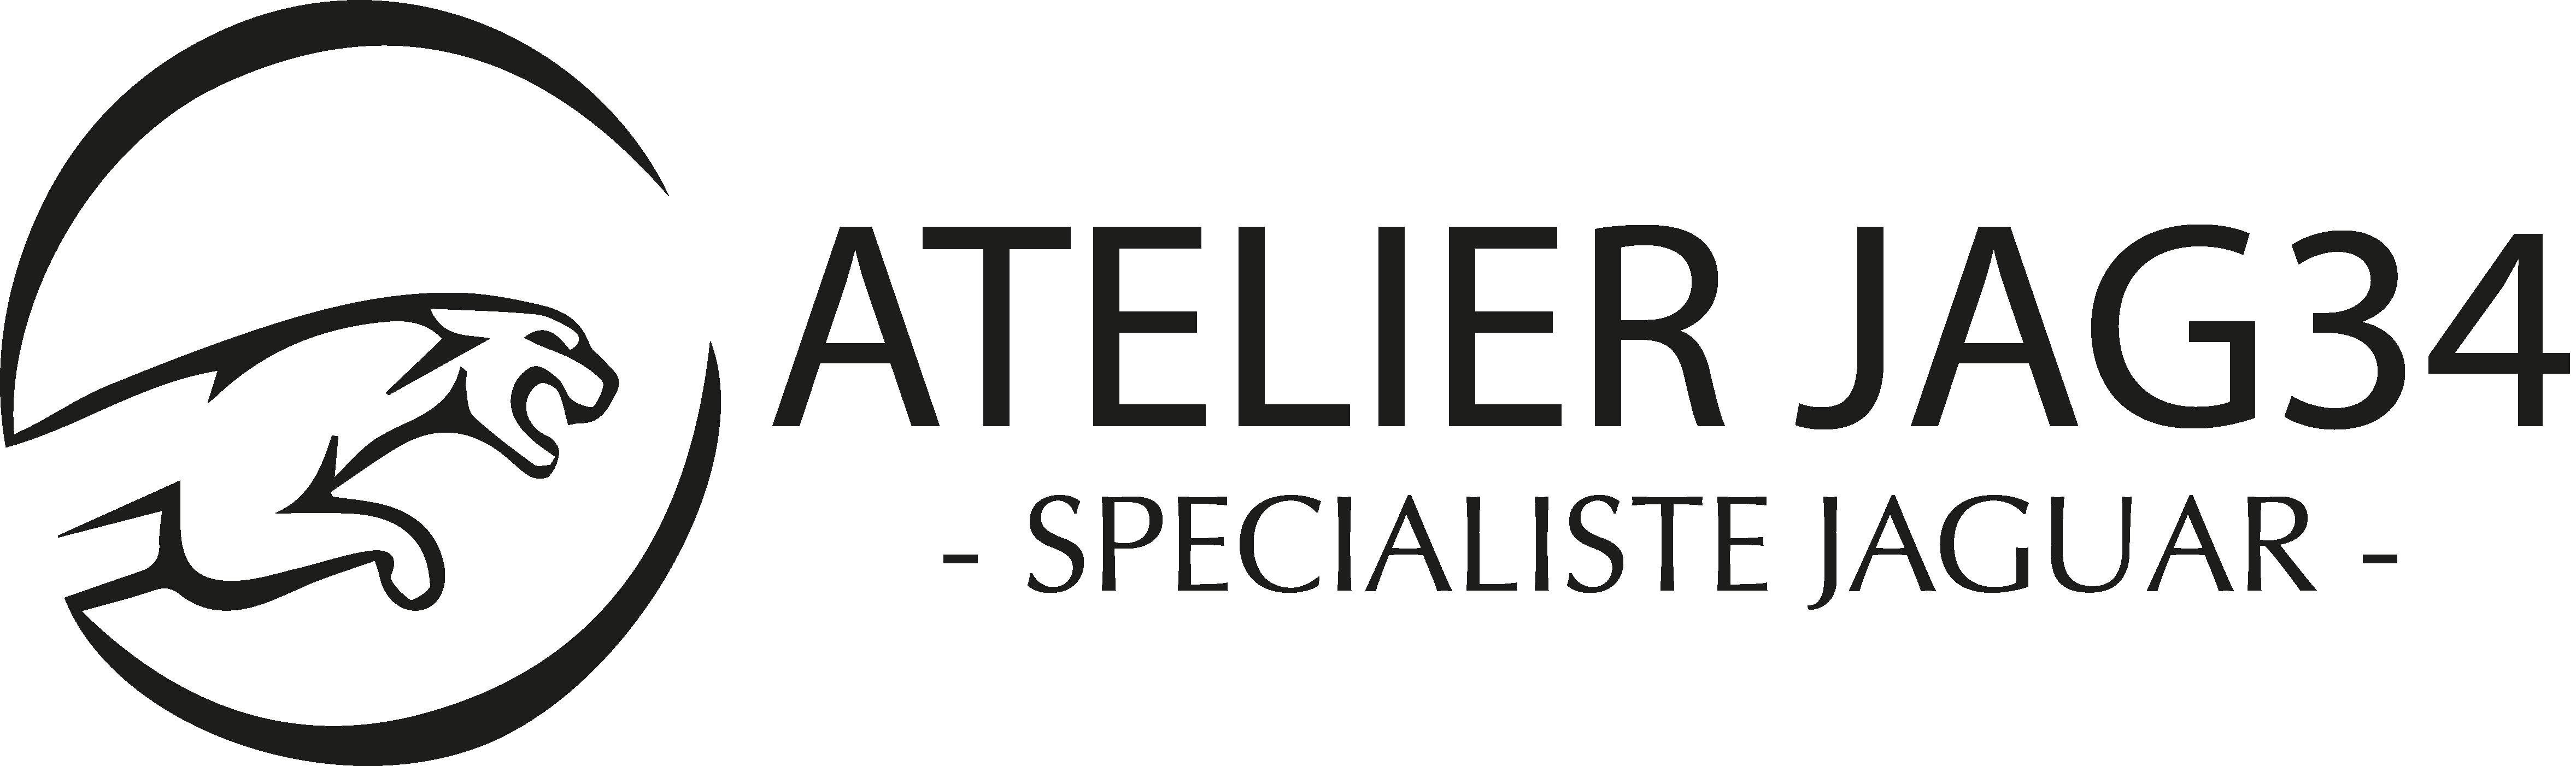 Logo ATELIER JAG34